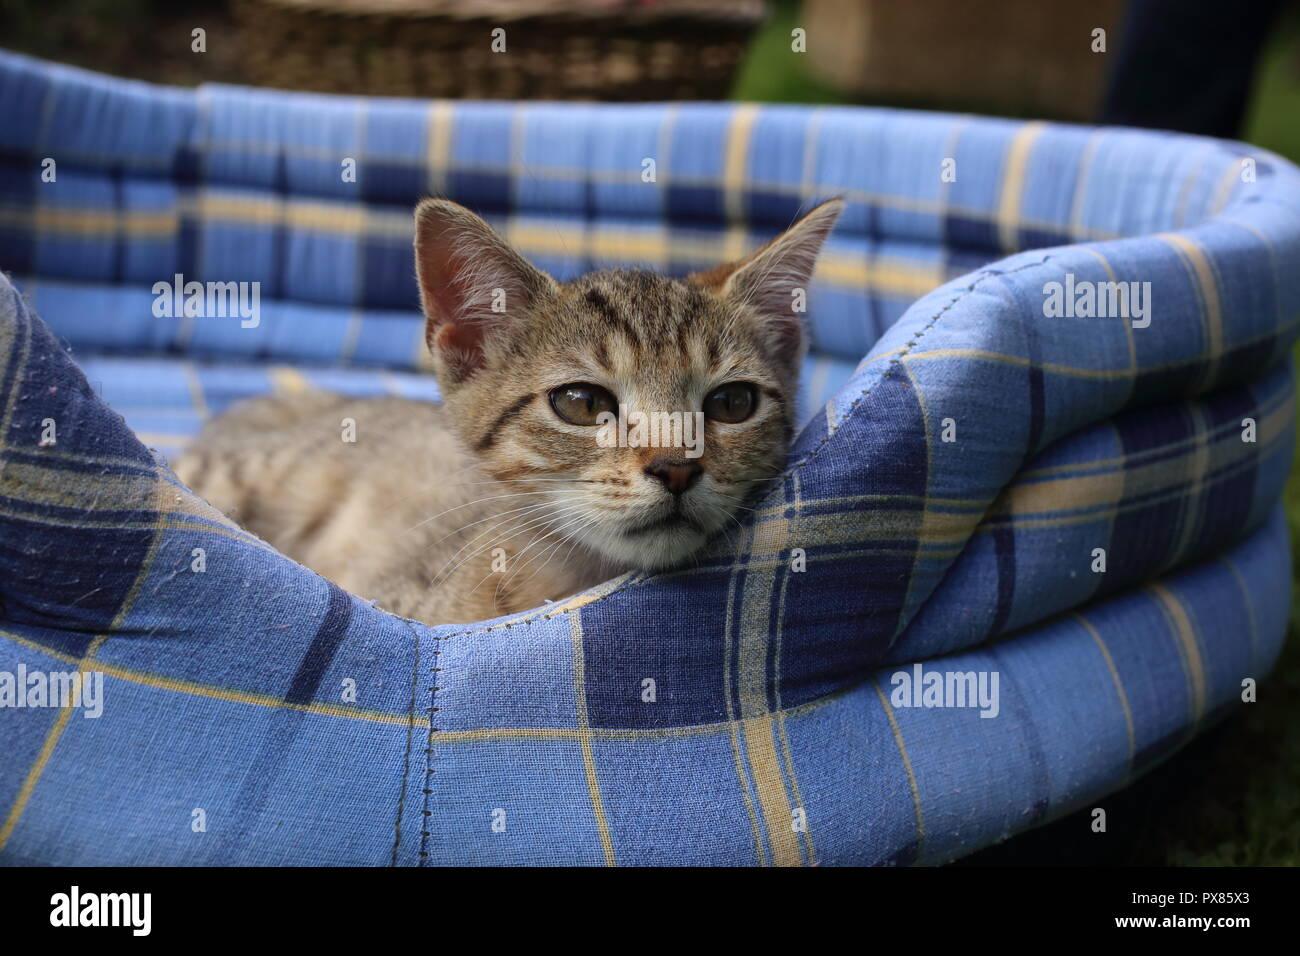 Sleepy kitten on soft blue pet bed in the garden - Stock Image